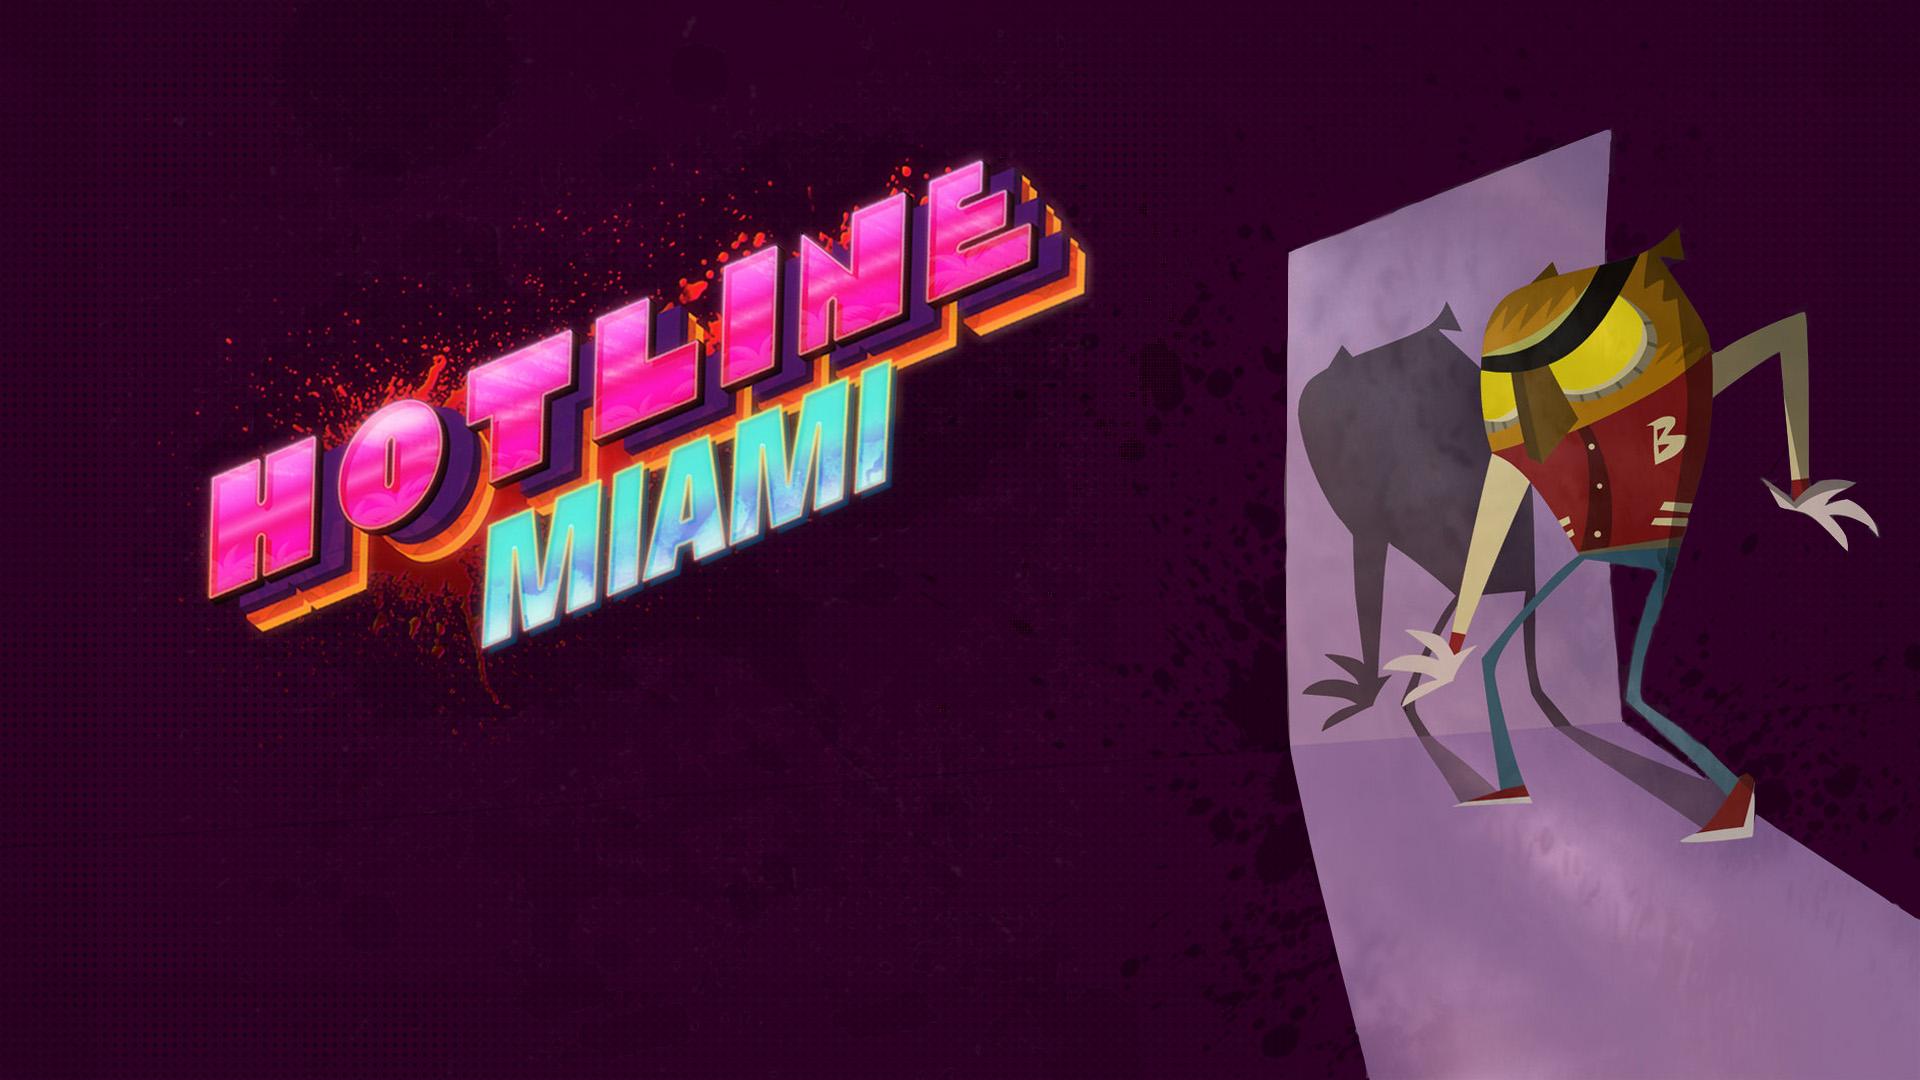 Hotline Miami Rasmus by HD Wallpaper